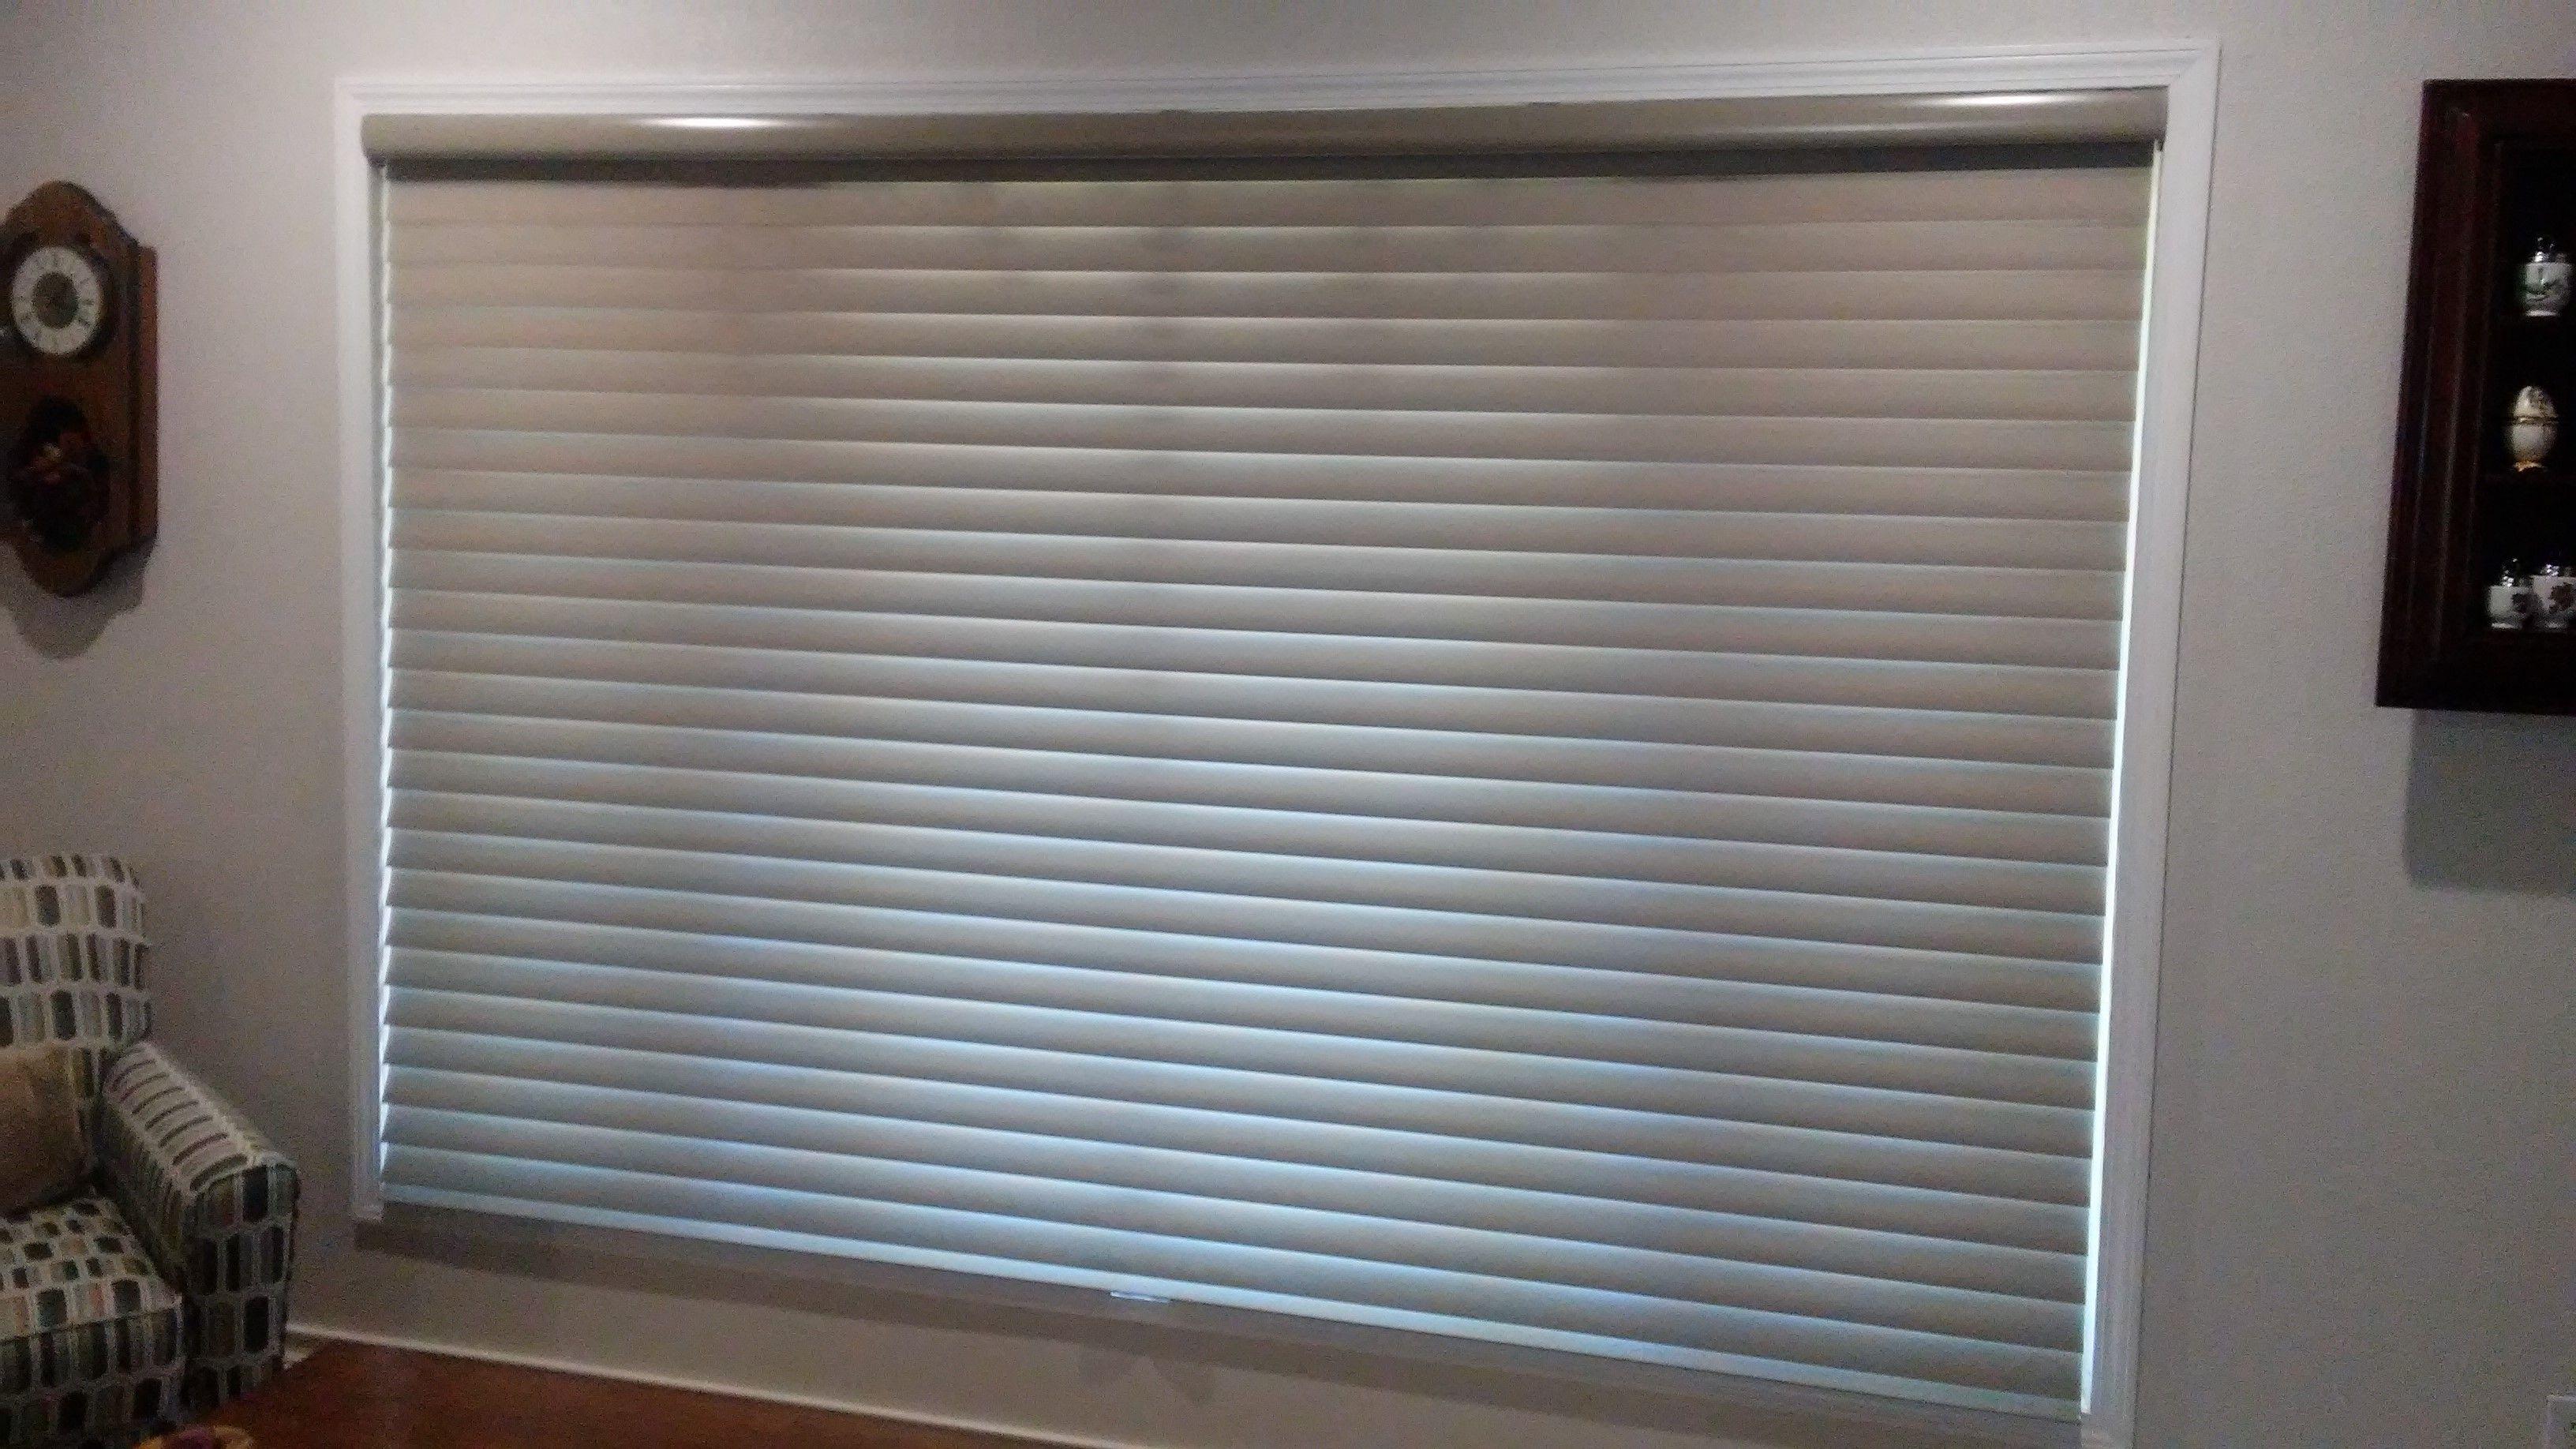 inc windows shades window interior installation covering shutters treatment toronto room darkening oakville portfolio view doors coverings burlington blinds fasada perfect